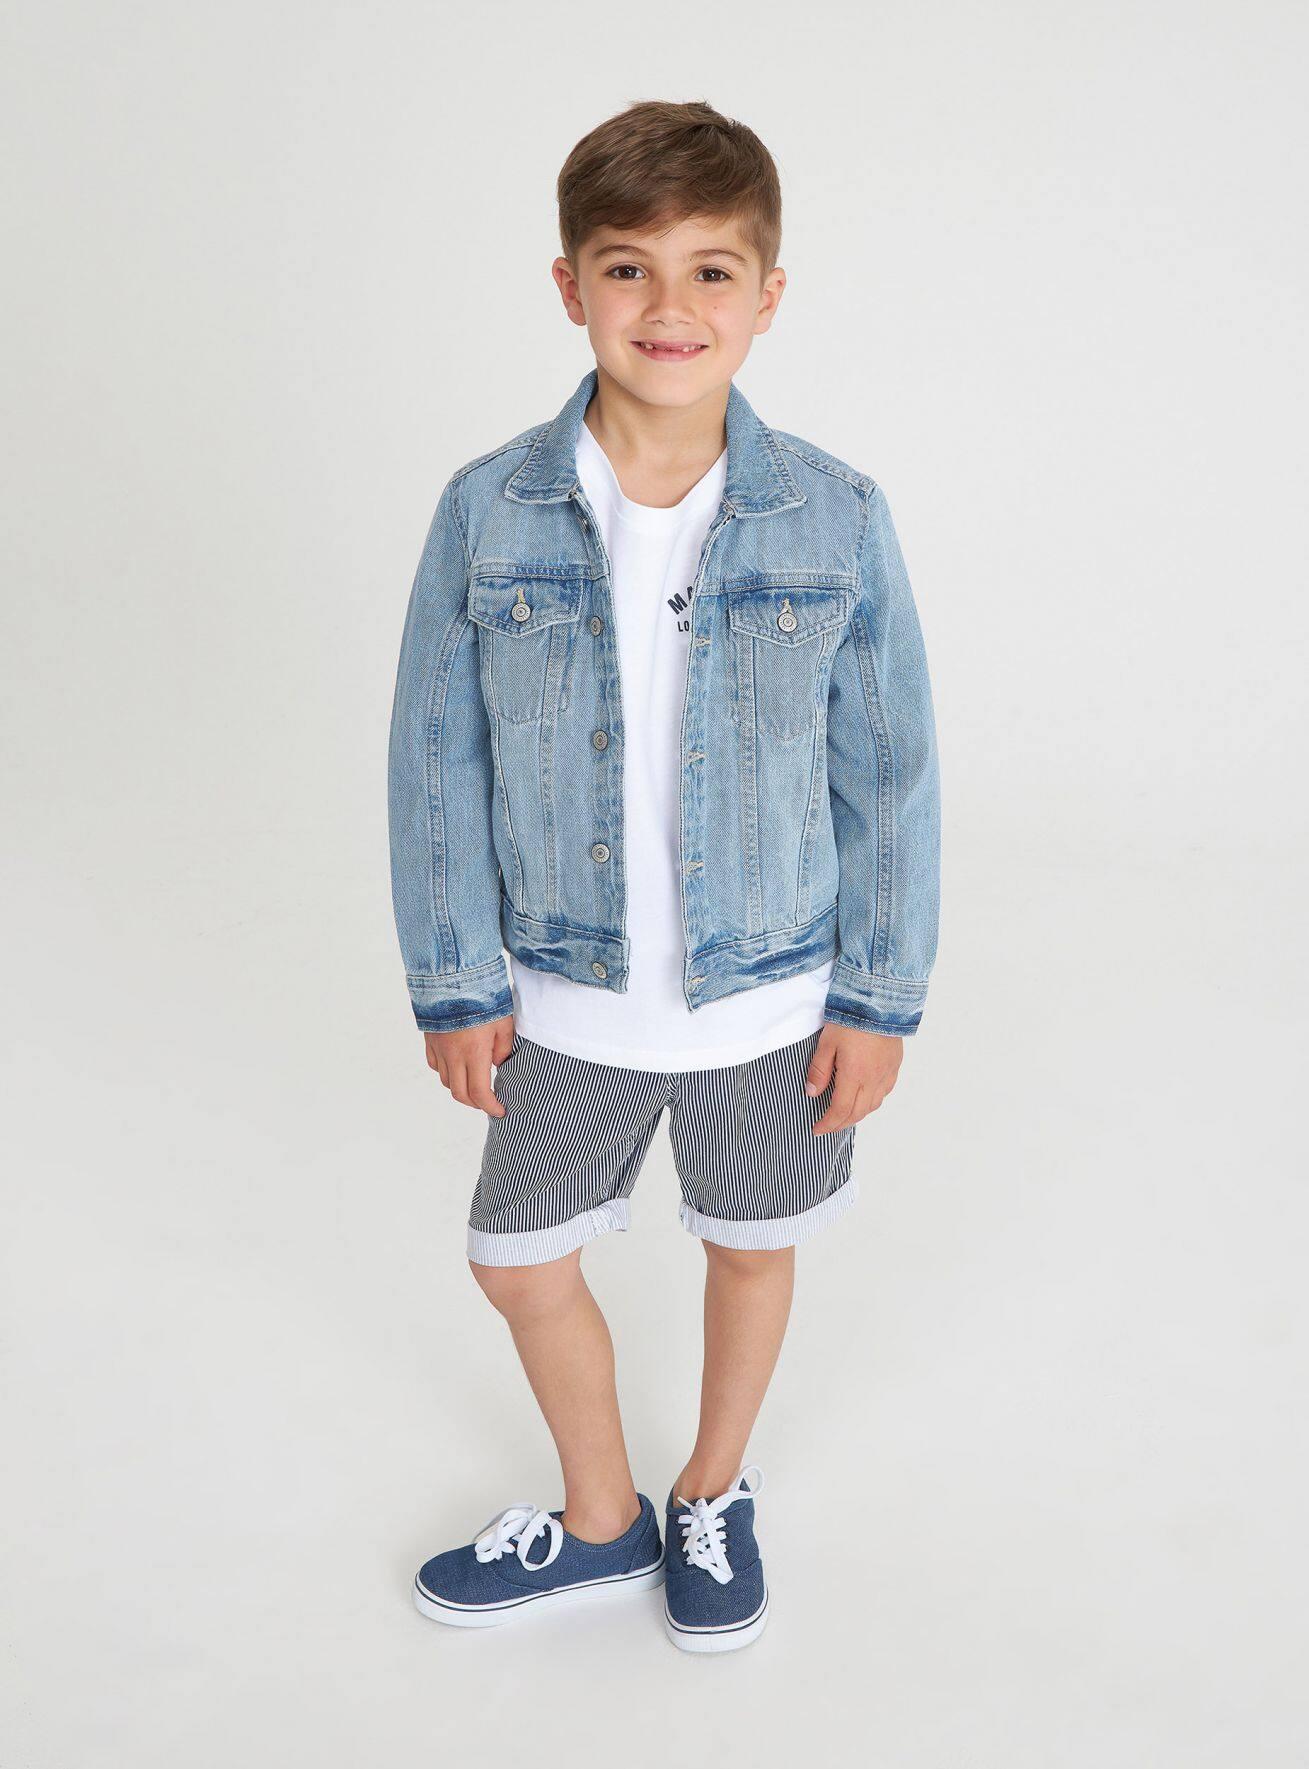 Pantalone Corto Junge Terranova